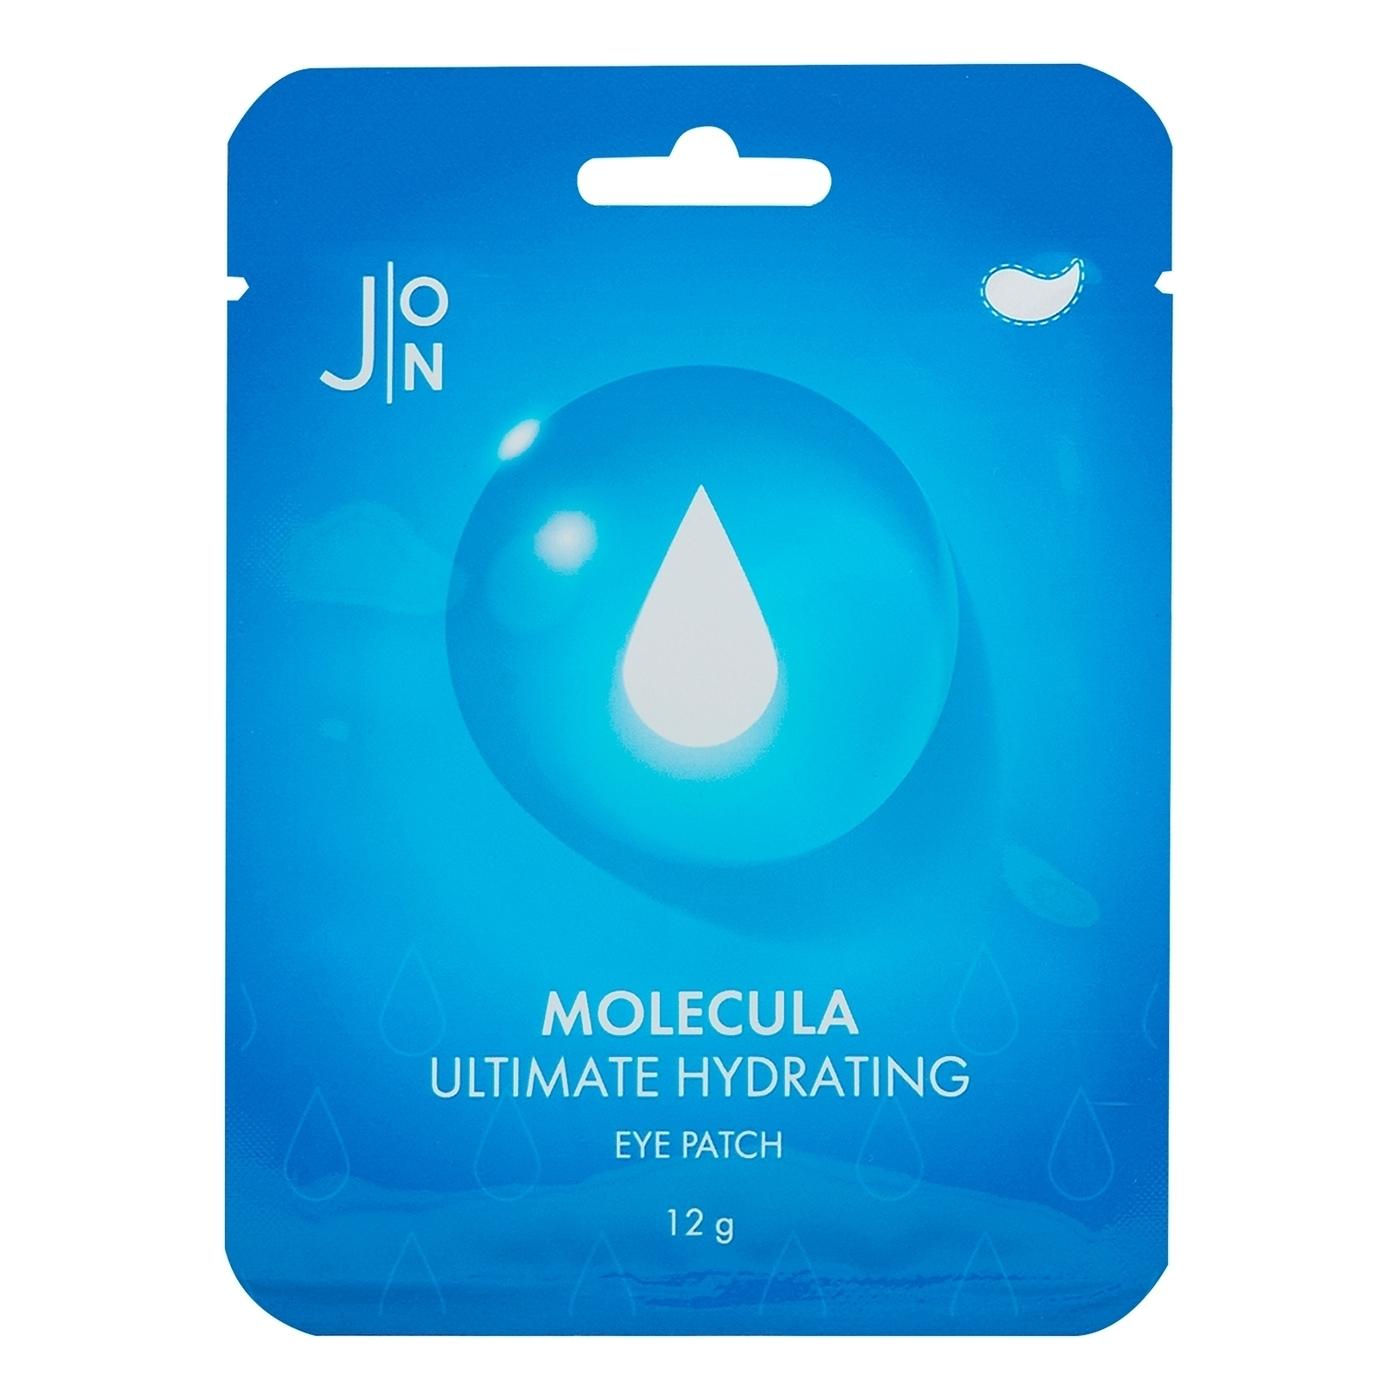 Патчи для глаз Патчи для глаз тканевые УВЛАЖНЕНИЕ J:ON Molecula Ultimate Hydrating еye Patch 12 гр 6034337796.jpg